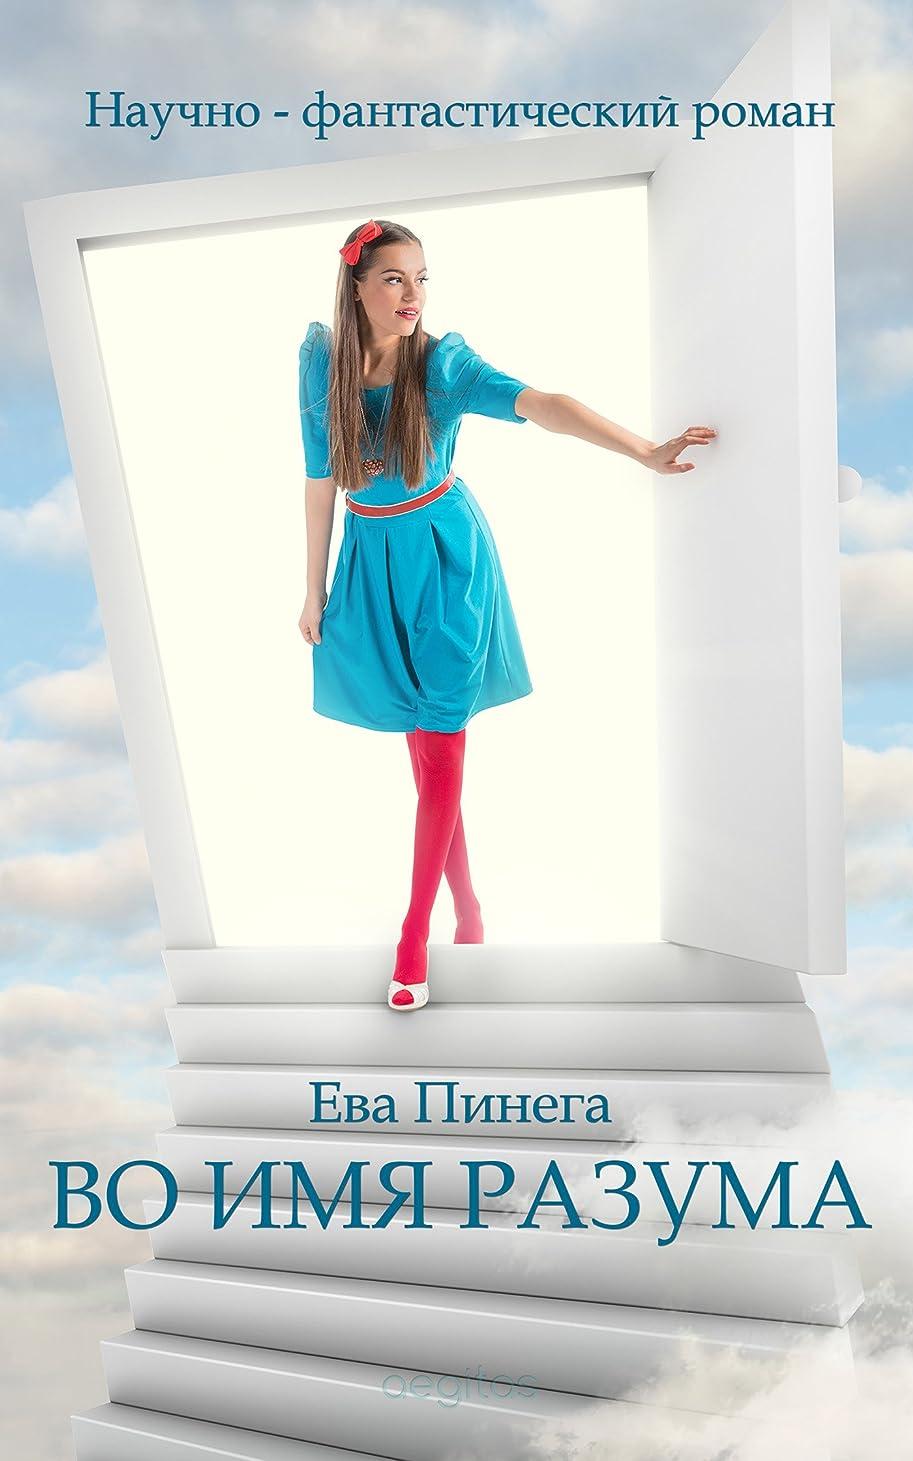 Во имя разума (Russian Edition)